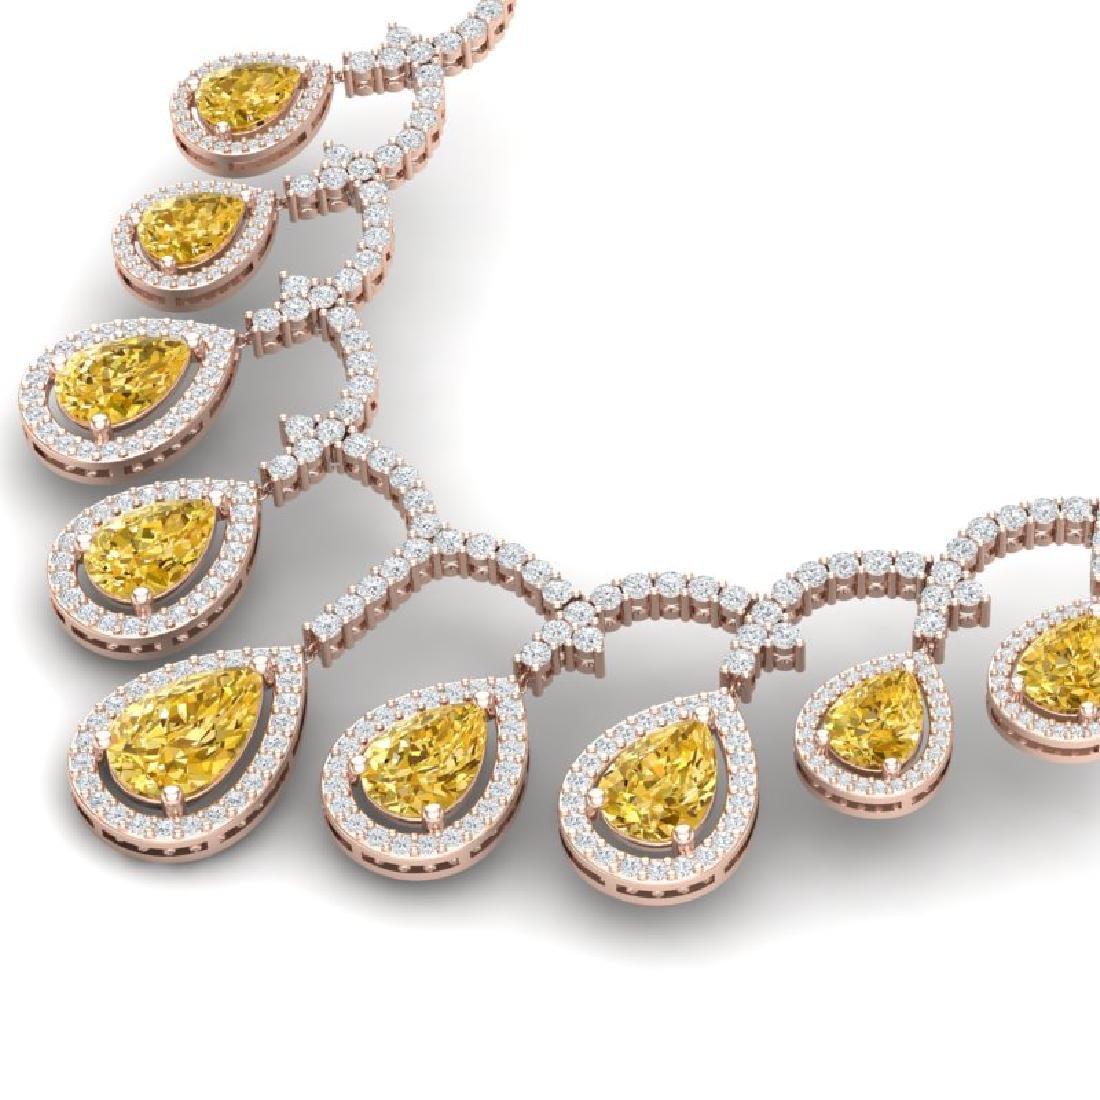 29.42 CTW Royalty Canary Citrine & VS Diamond Necklace - 2